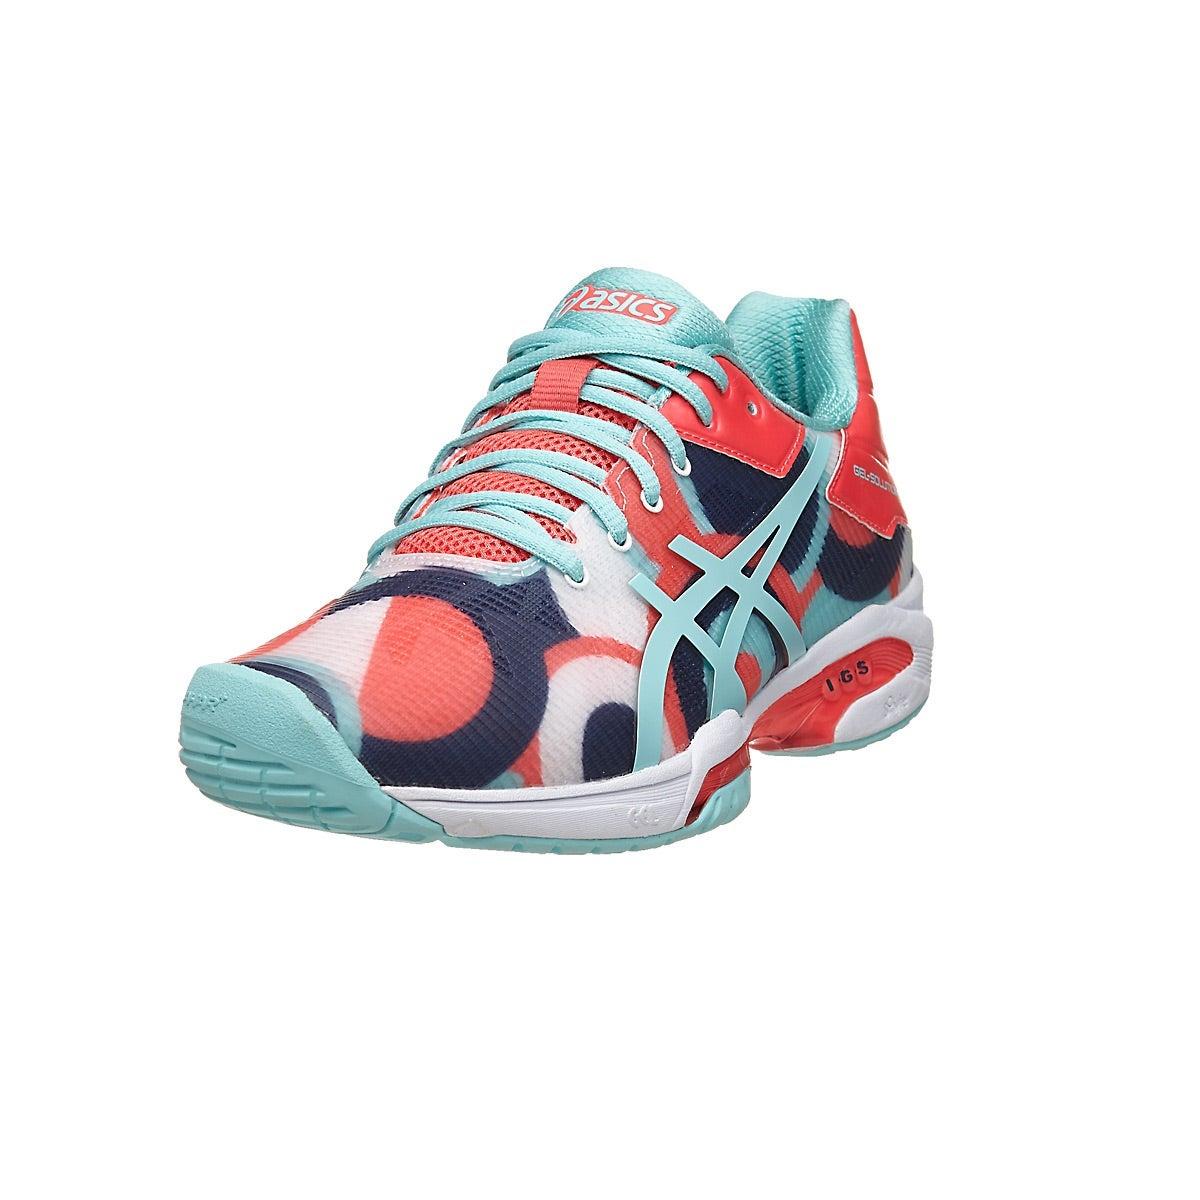 Chaussures Femme Asics Gel Solution Solution Speed 3 Groove 3 Vue Asics 360 ° d2fff6f - caillouoyunlari.info